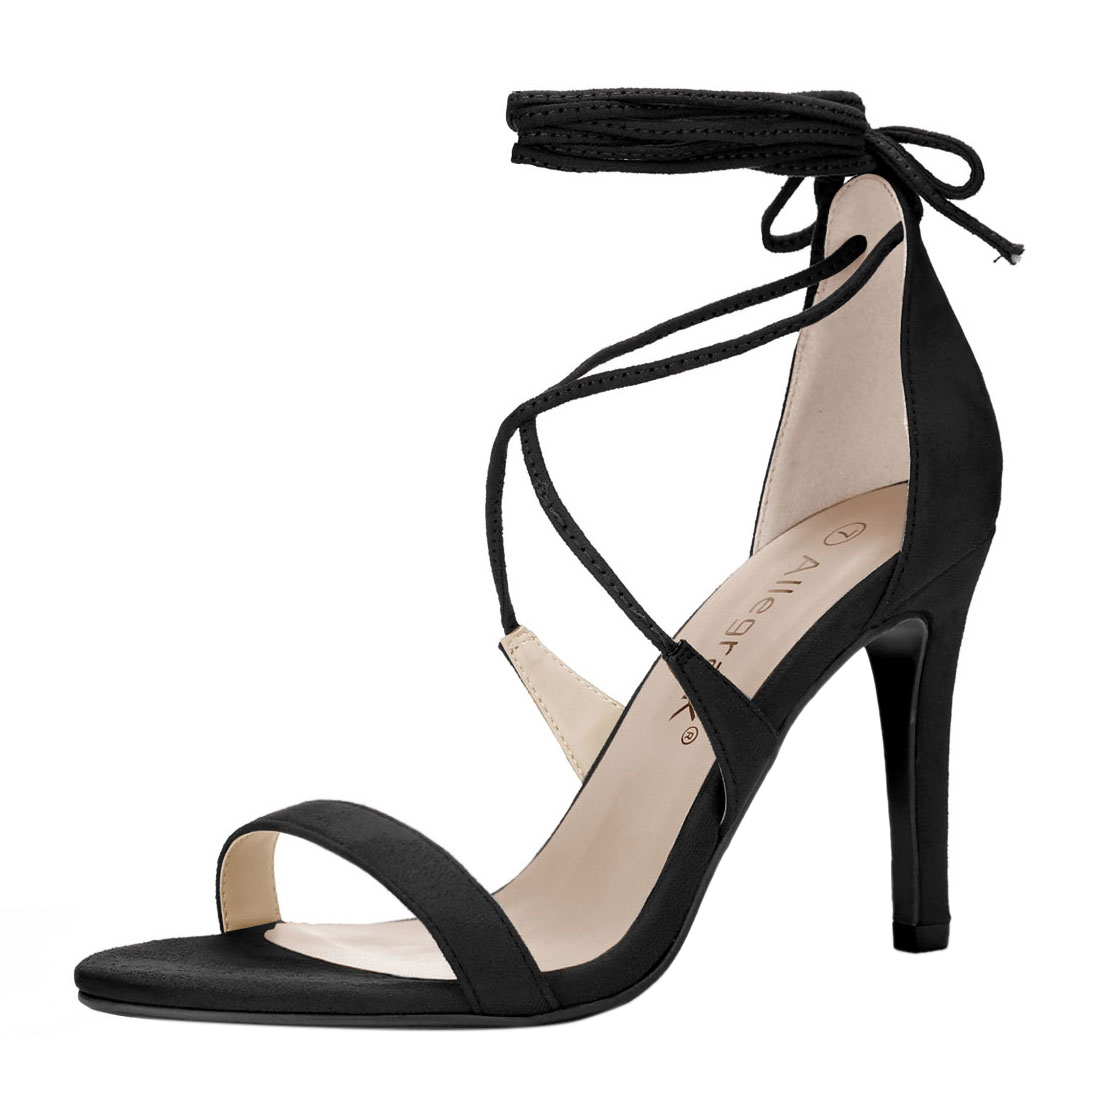 Women Open Toe Stiletto High Heel Lace-Up Sandals Black US 8